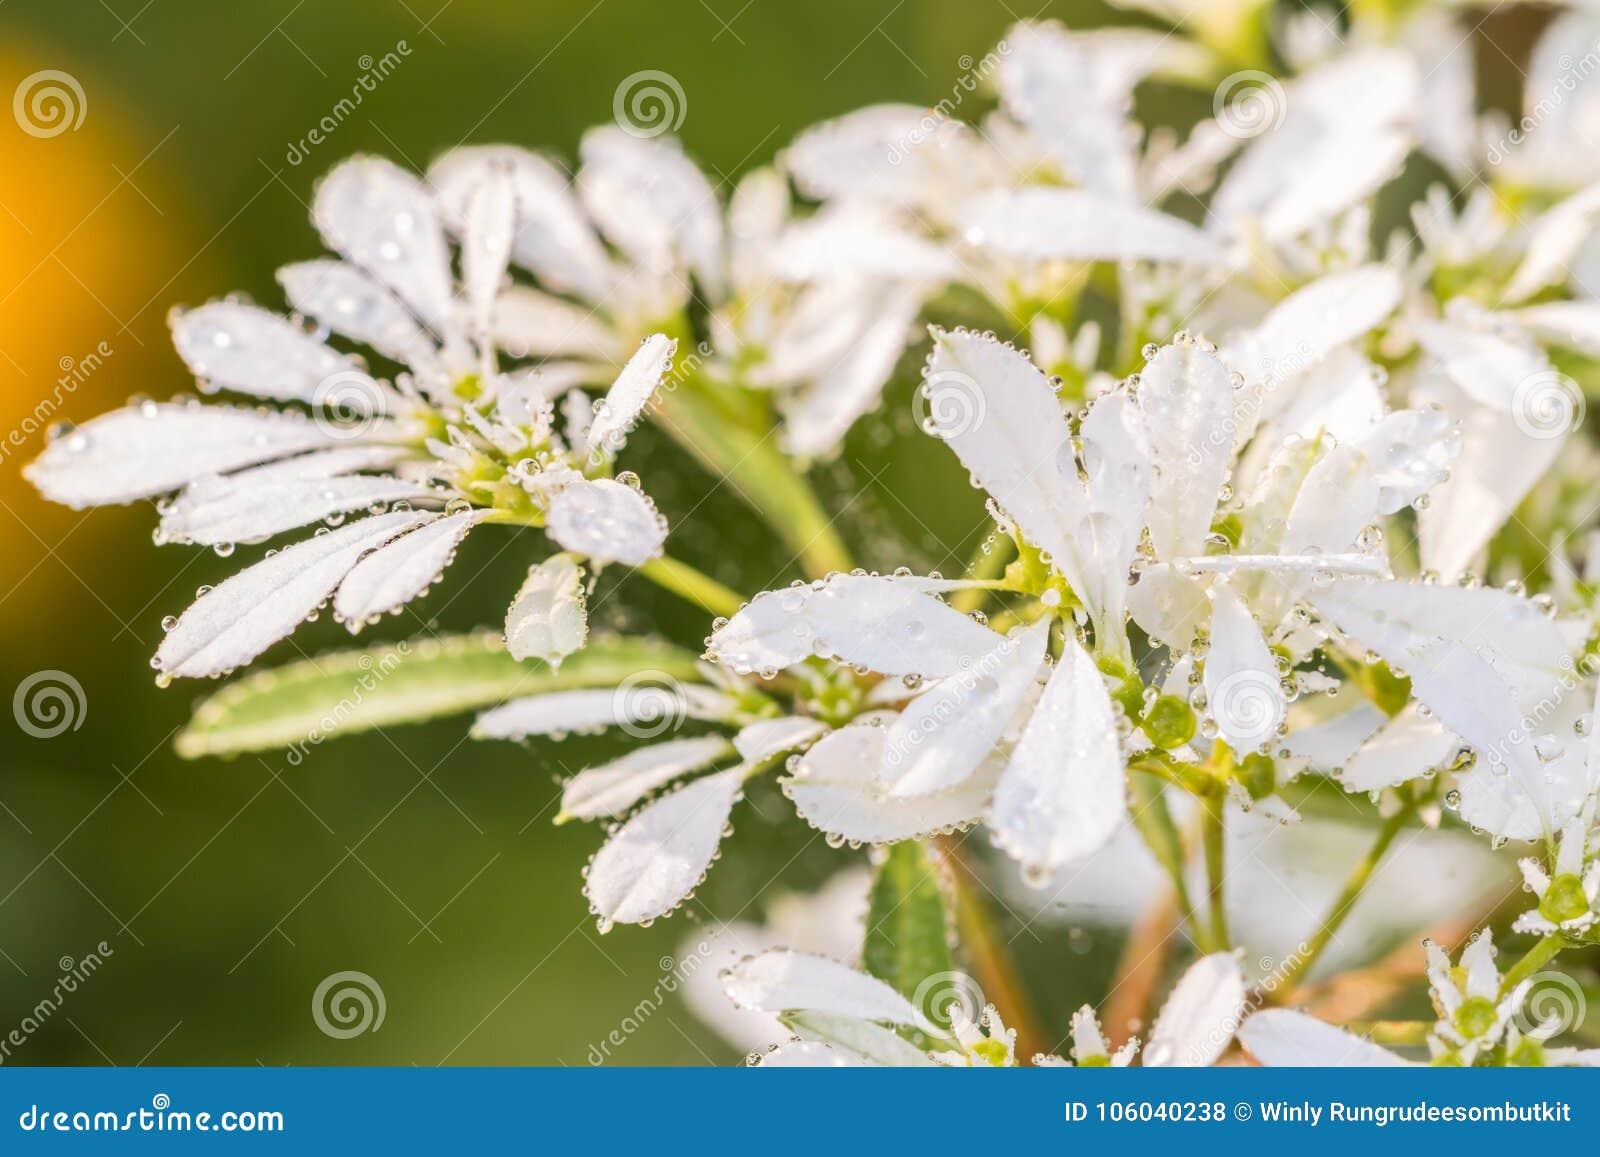 White Christmas Flower Pascuita Stock Photo Image Of Beauty